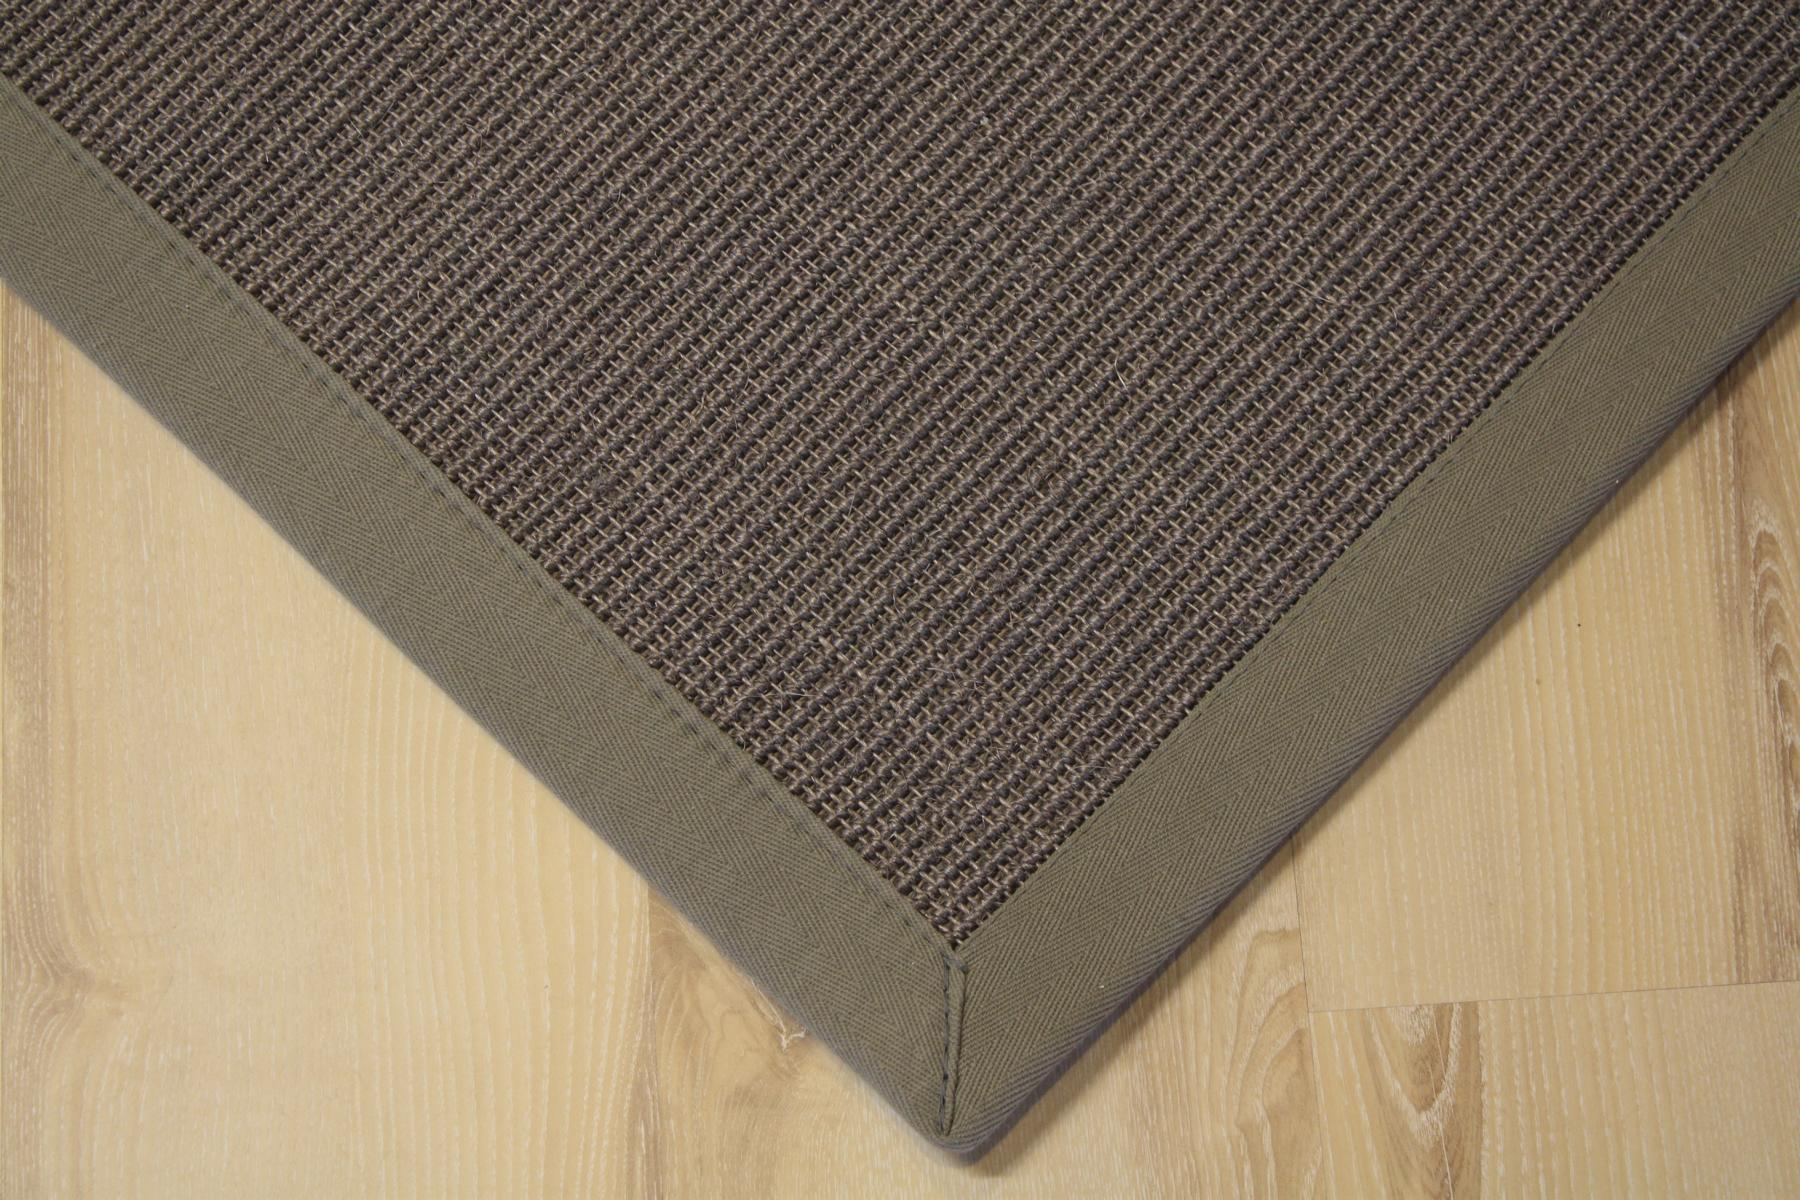 sisal teppich manaus mit bord re grau 250x350 cm 100 sisal ebay. Black Bedroom Furniture Sets. Home Design Ideas